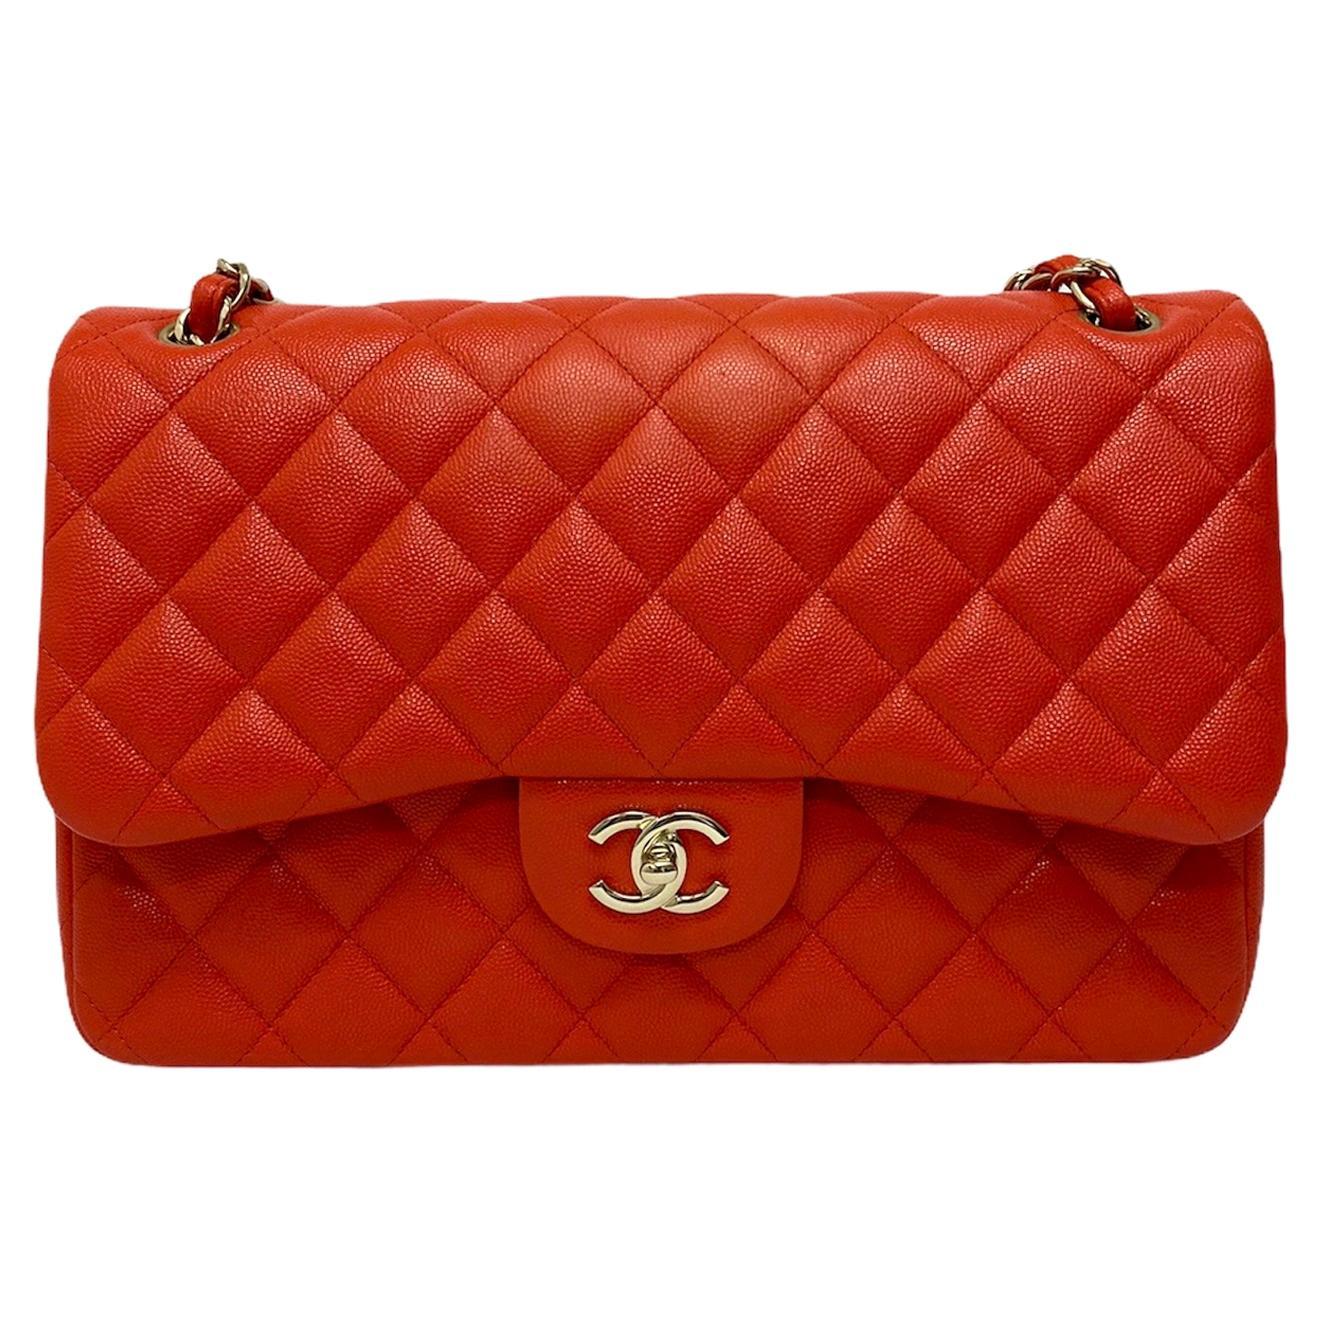 2019 Chanel Red Leather Maxi Jumbo Bag